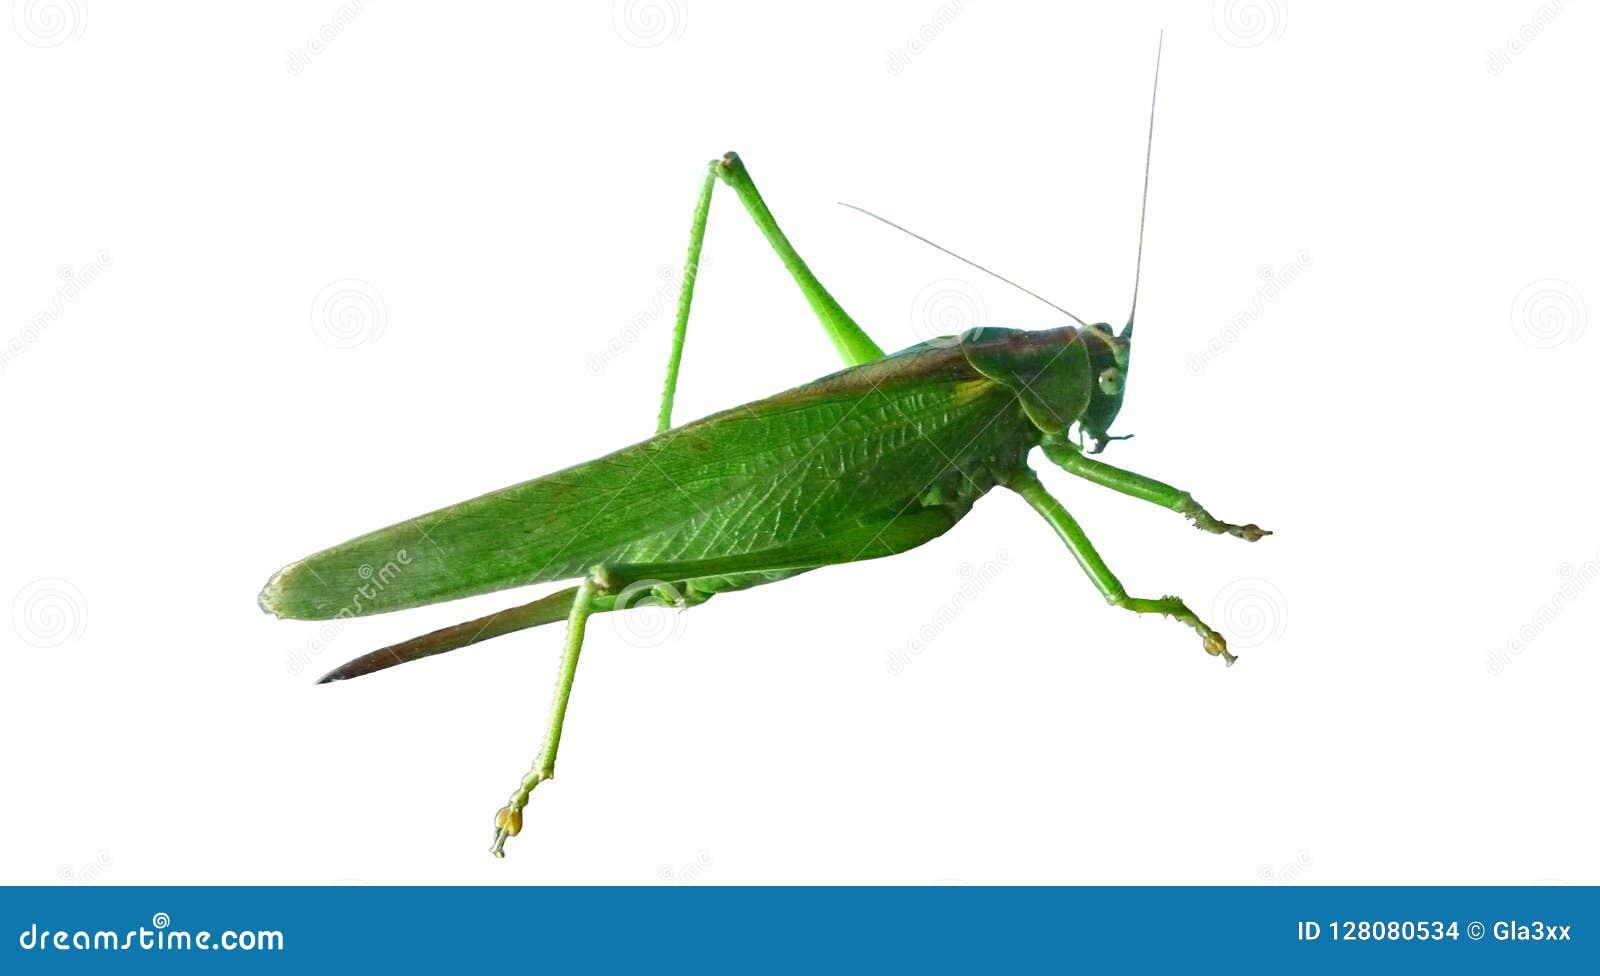 Vert de sauterelle sauterelle